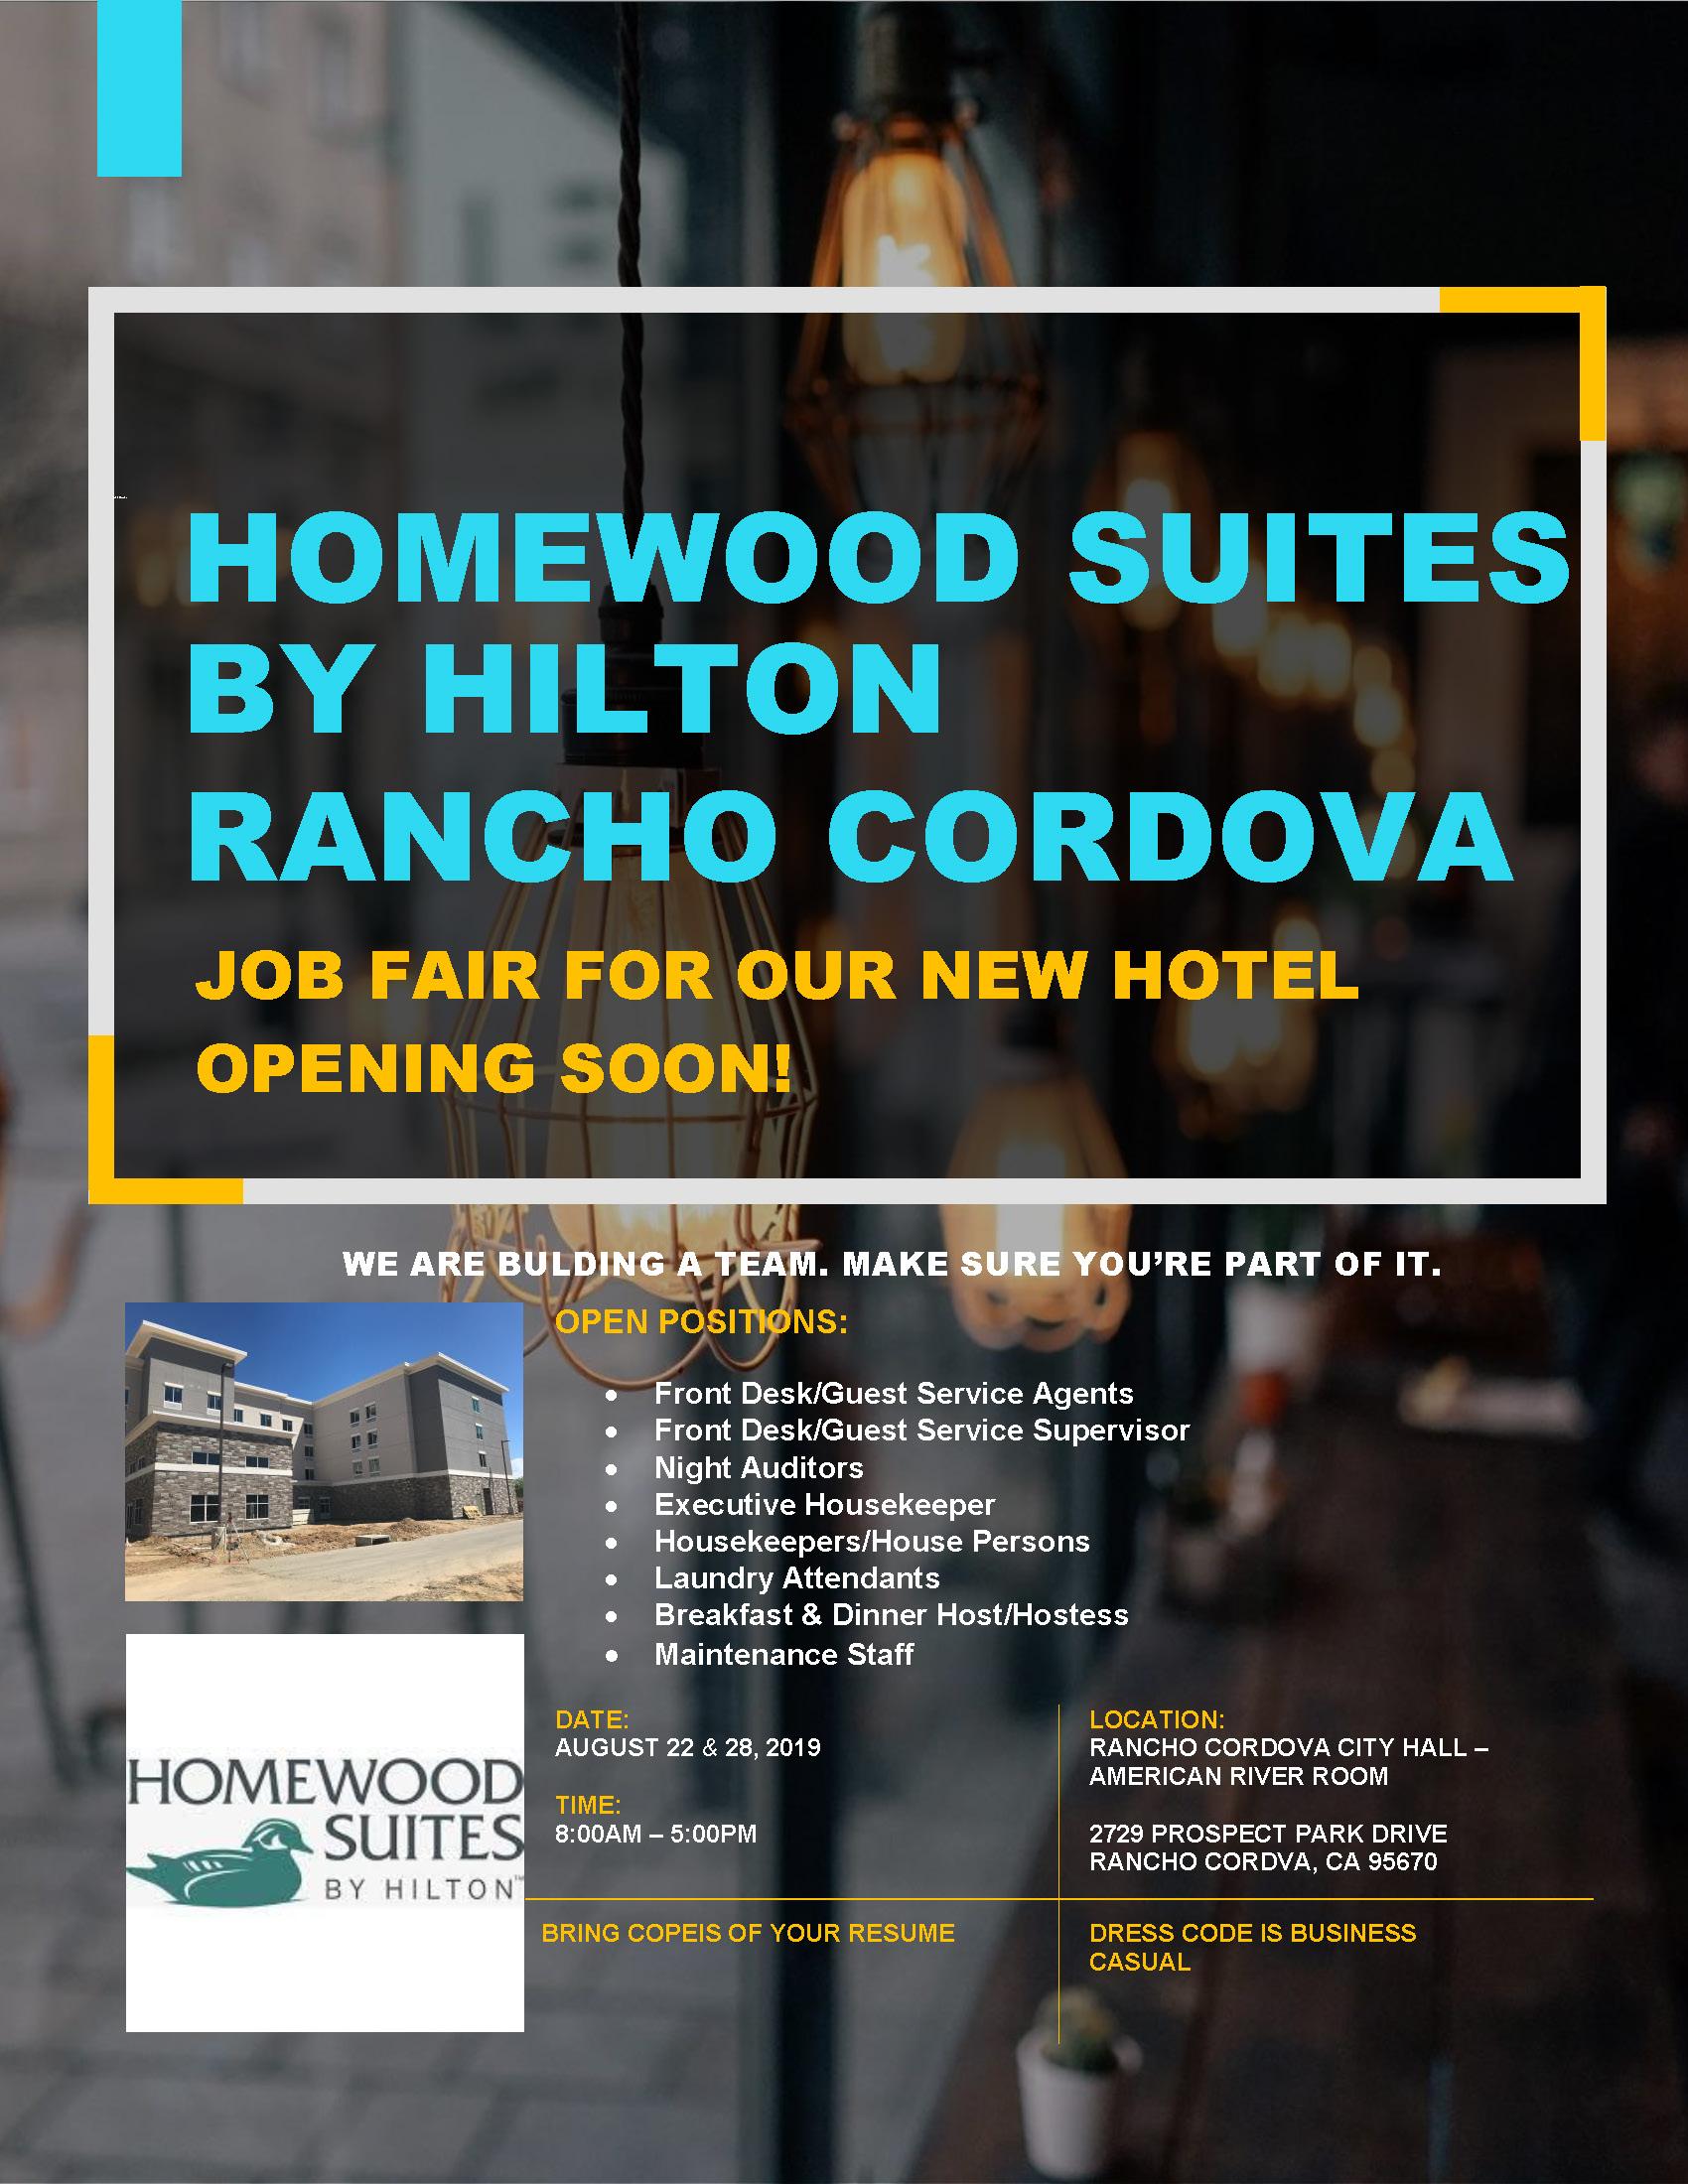 Homewood Suites by Hilton Rancho Cordova Job Fair   Events